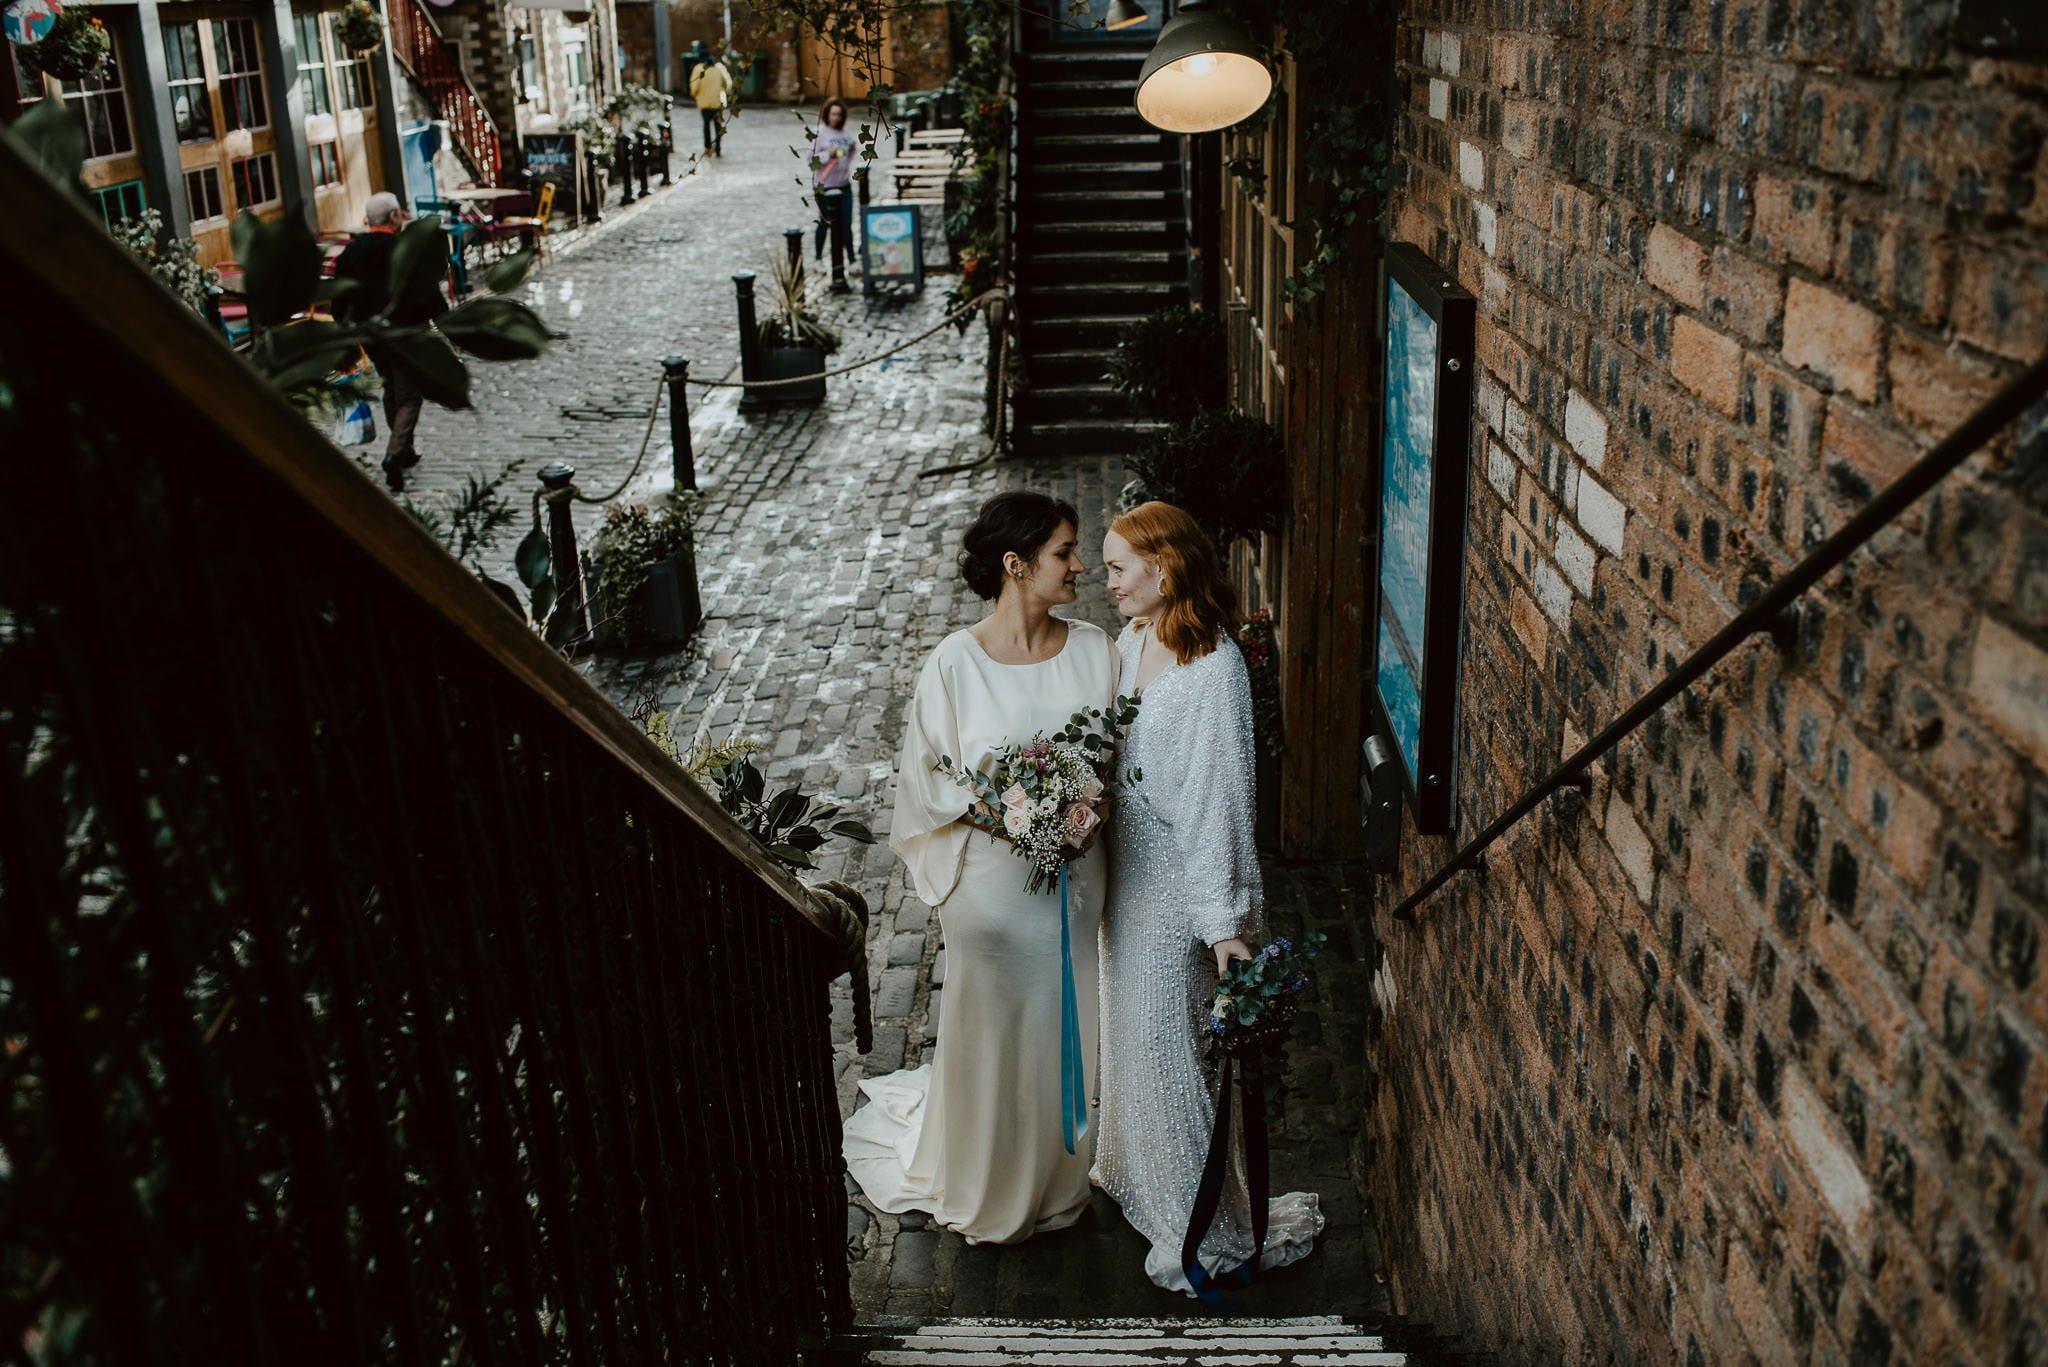 A Dreamy Pre-Raphaelite Wedding at the Bothy in Glasgow 40